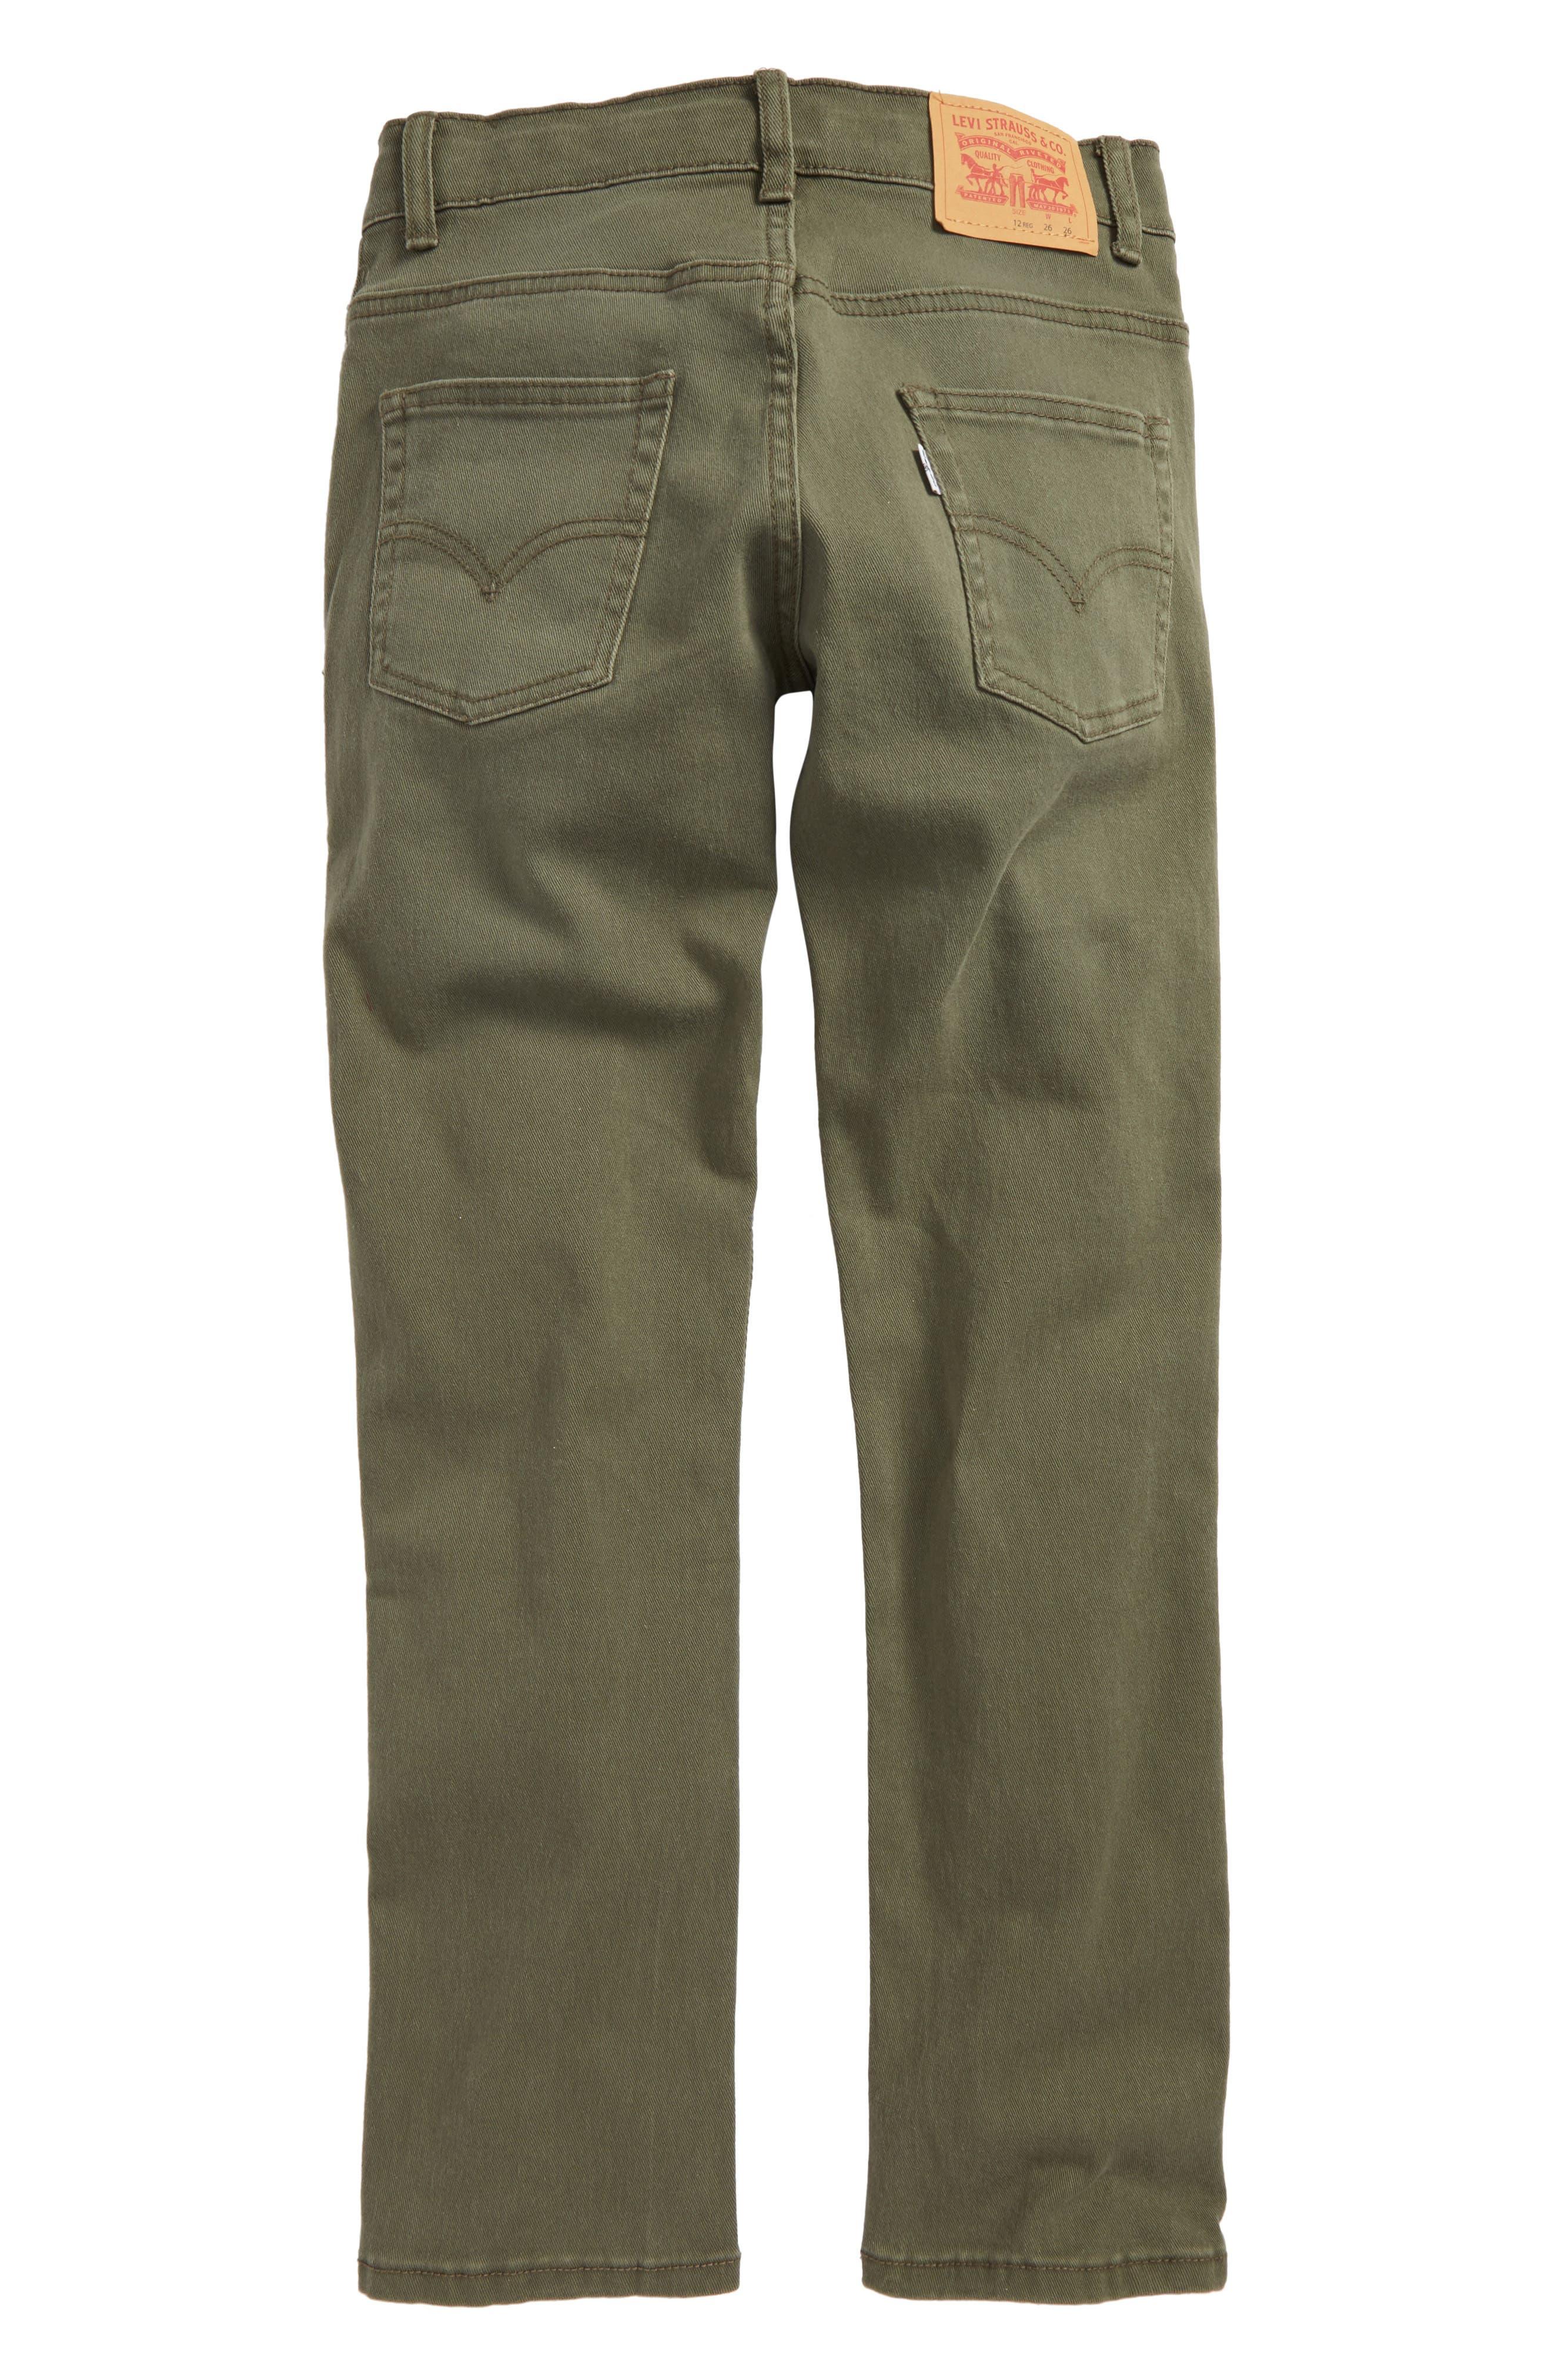 511 Slim Fit Jeans,                             Alternate thumbnail 3, color,                             Olive Night